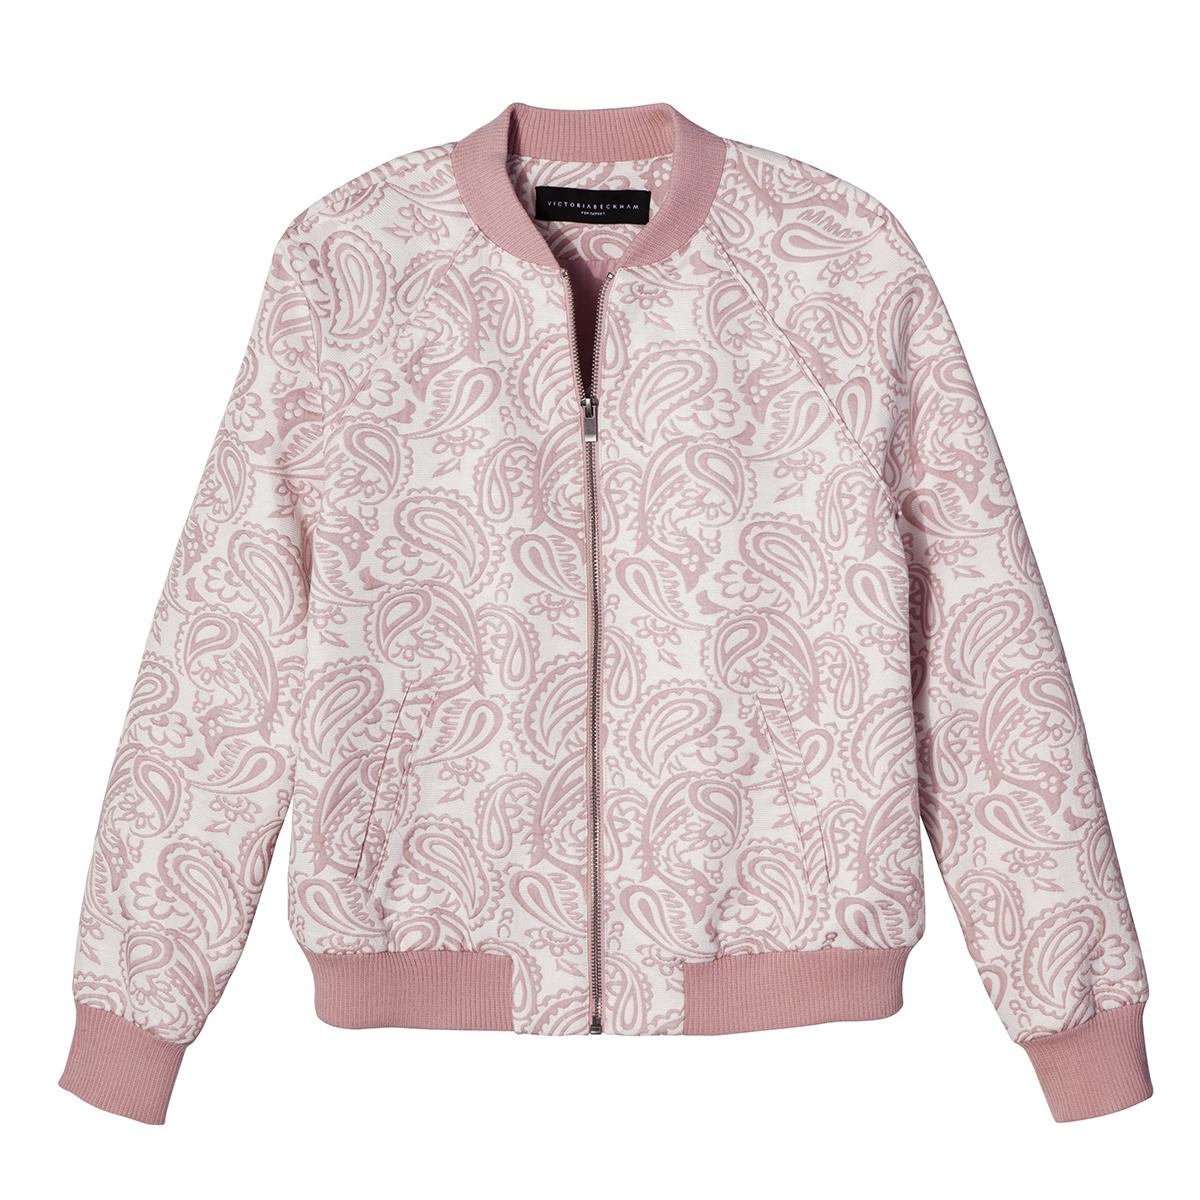 Blush Floral Jacquard Bomber Jacket, $35